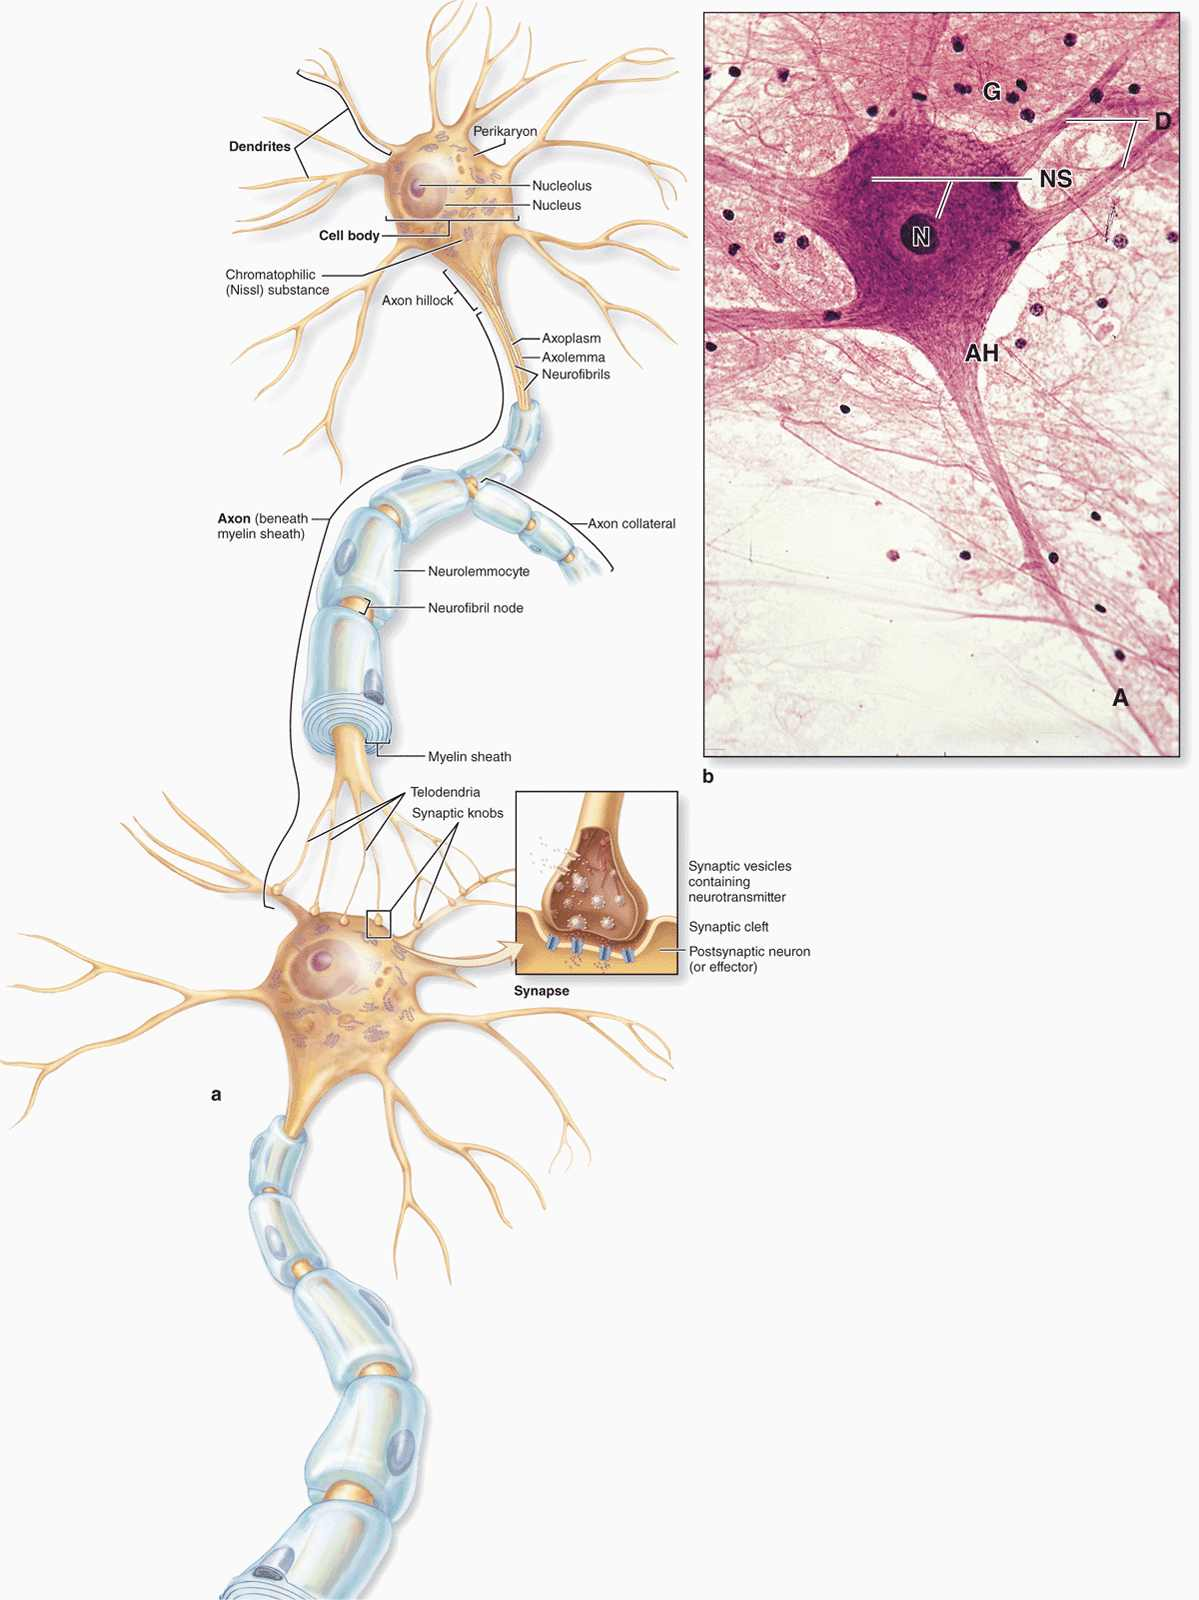 basic neuron diagram radio wiring for 1995 chevy silverado nerve tissue and the nervous system basicmedical key